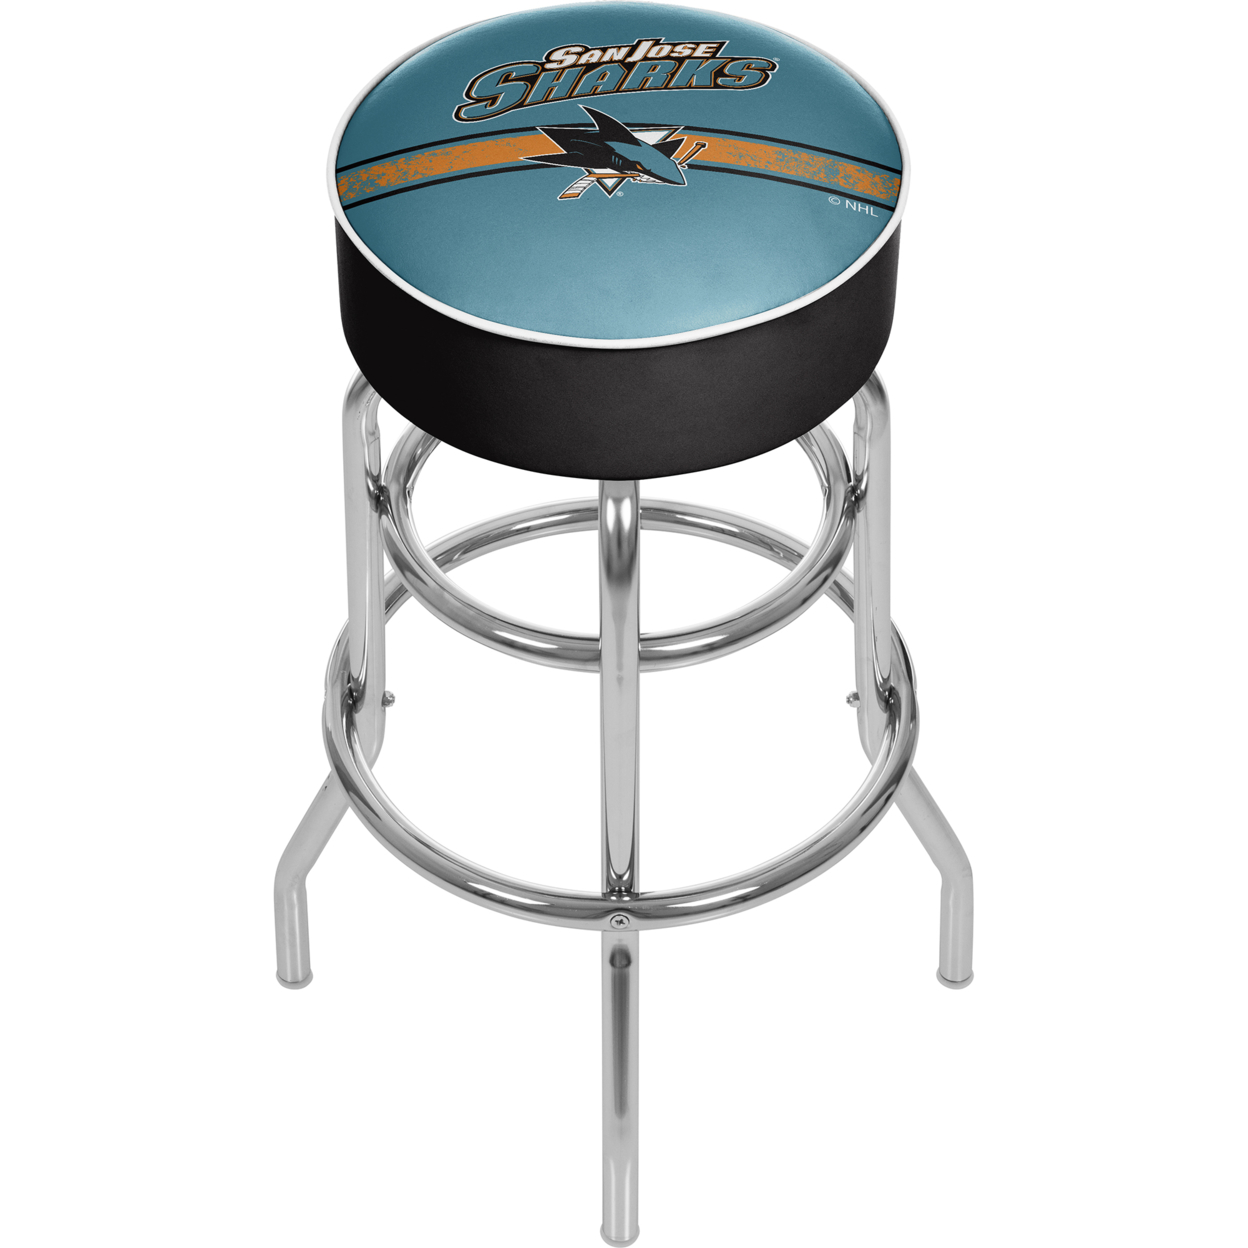 NHL Chrome Padded Swivel Bar Stool 30 Inches High - San Jose Sharks сумка printio san jose sharks